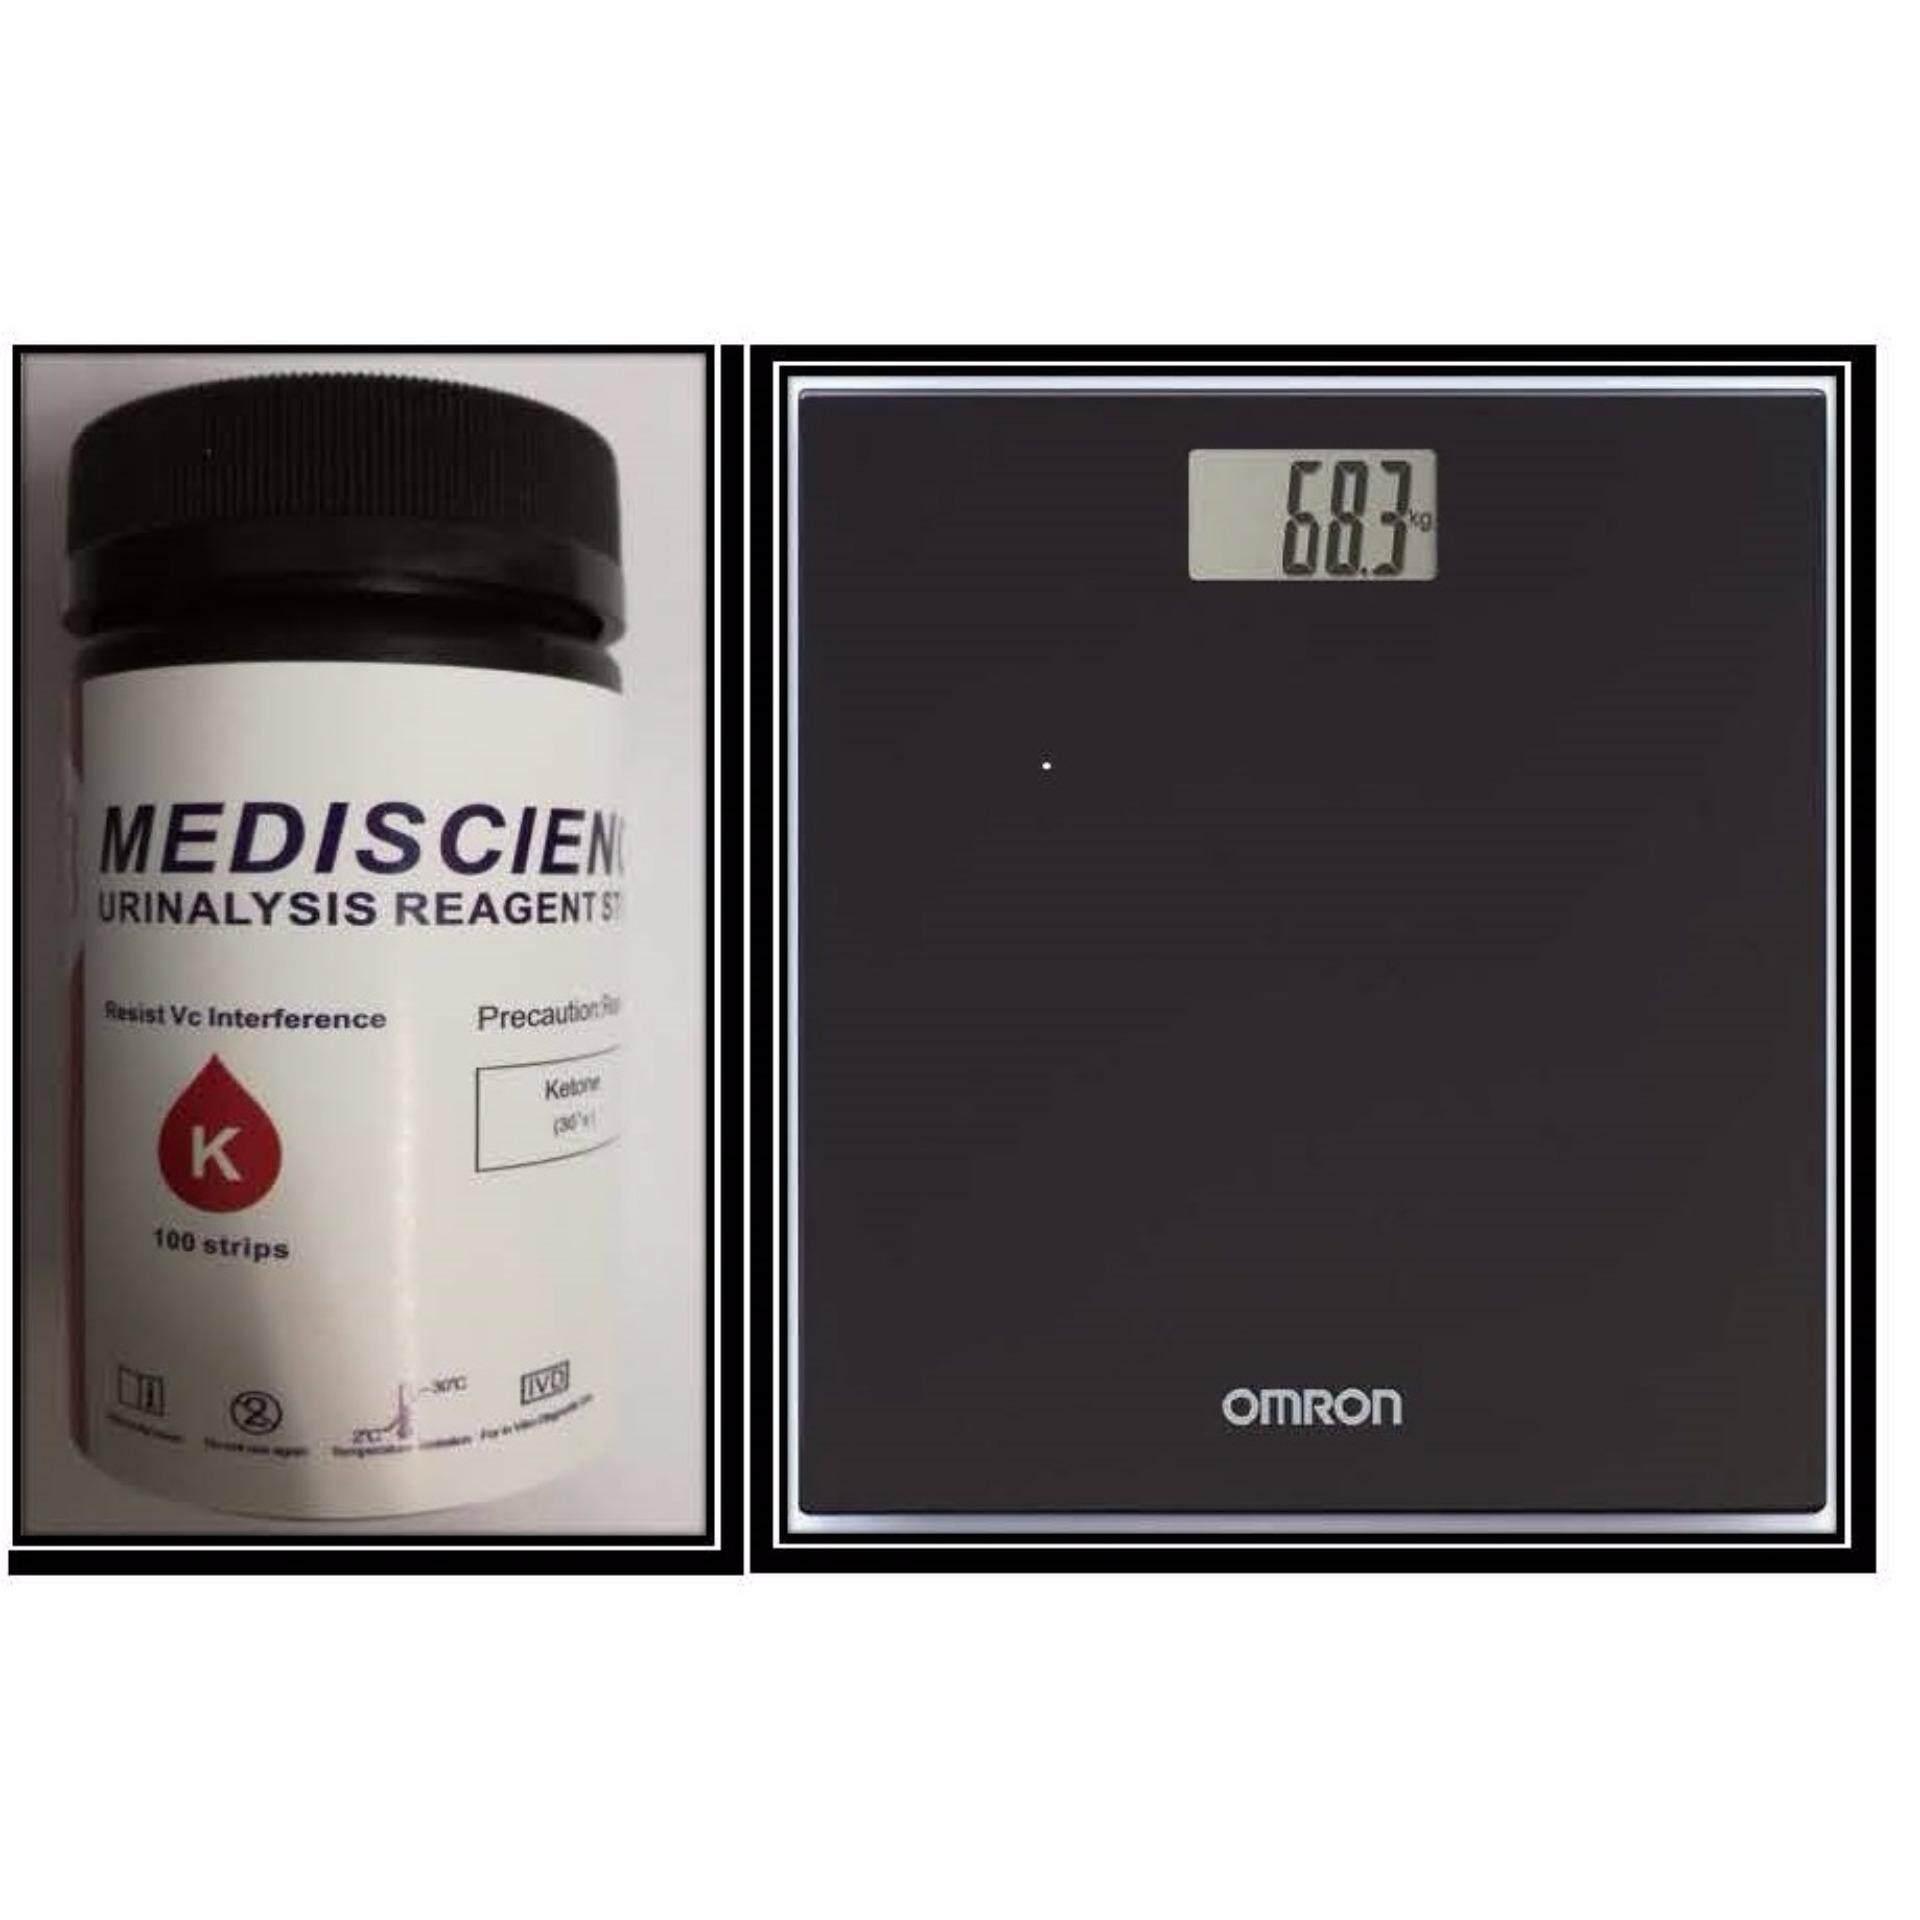 MediScience Ketone Urine Strips 100s+ Omron Weighing Scale HN289 Black (Warranty One Year)